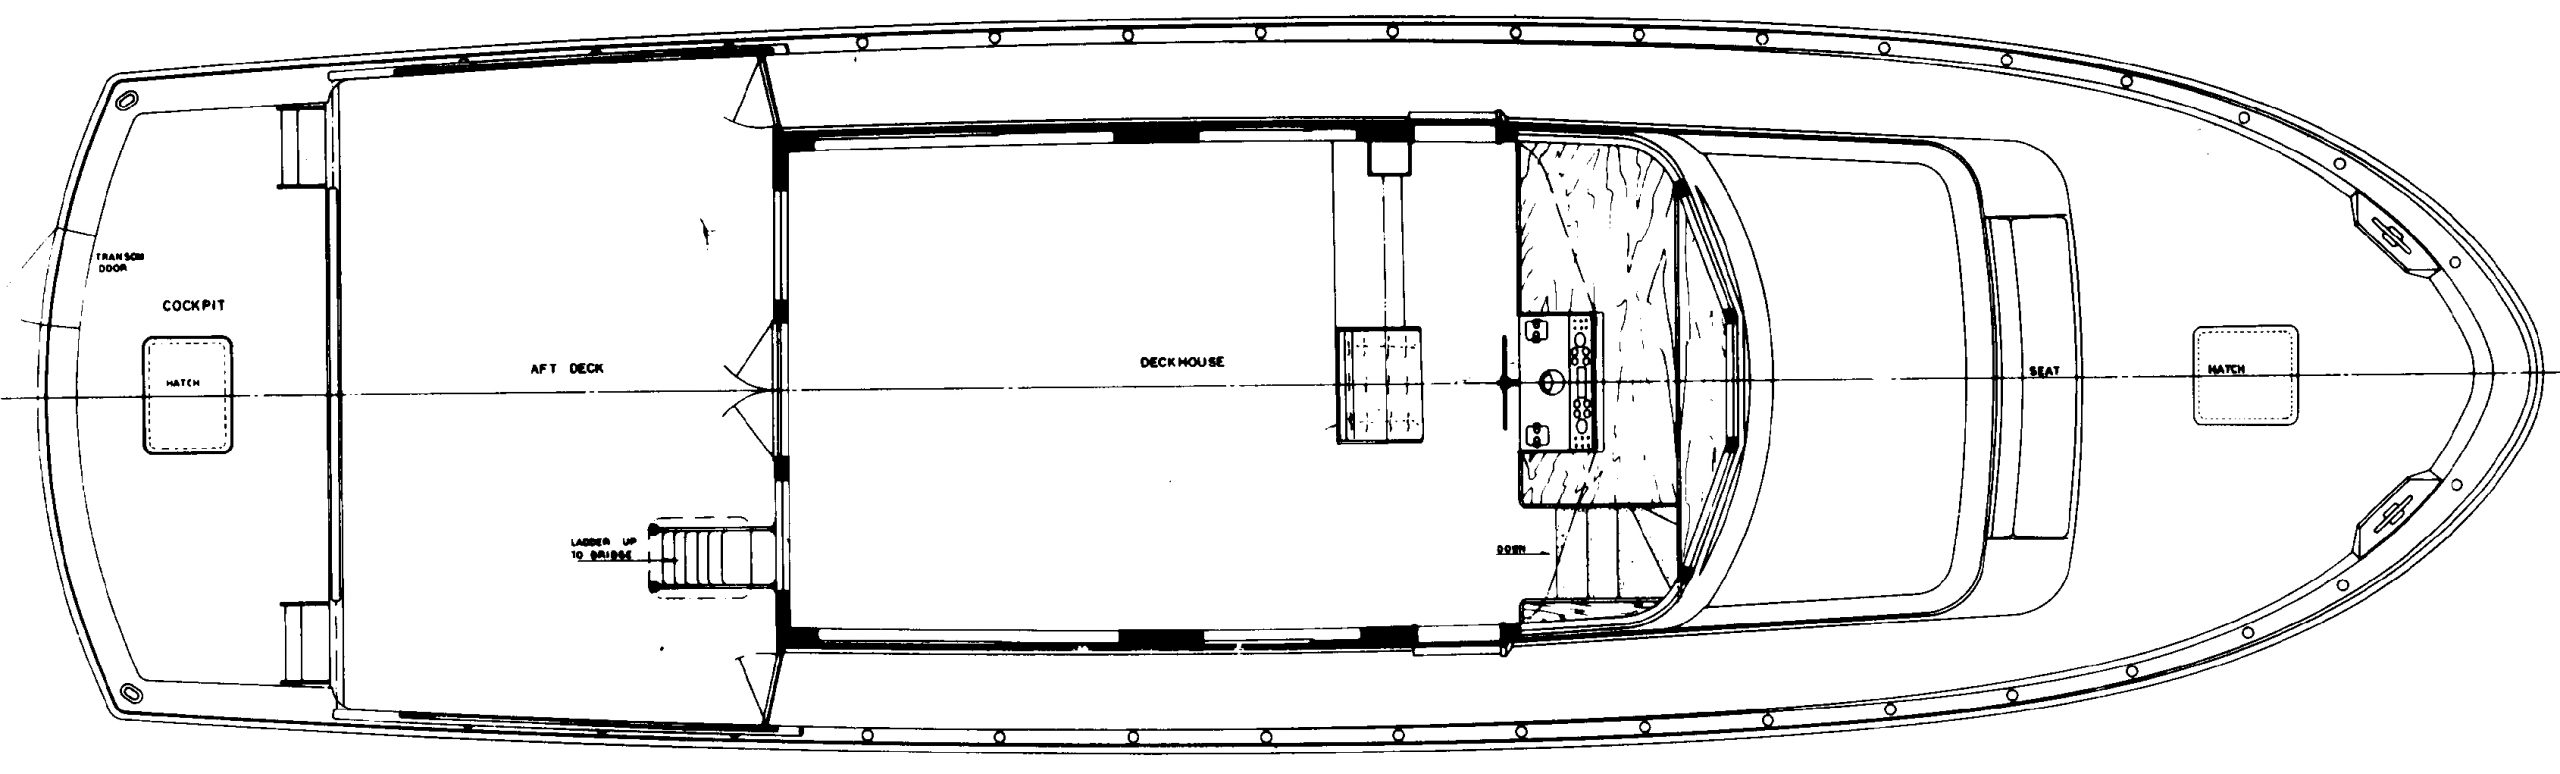 61 Cockpit Motor Yacht Floor Plan 2